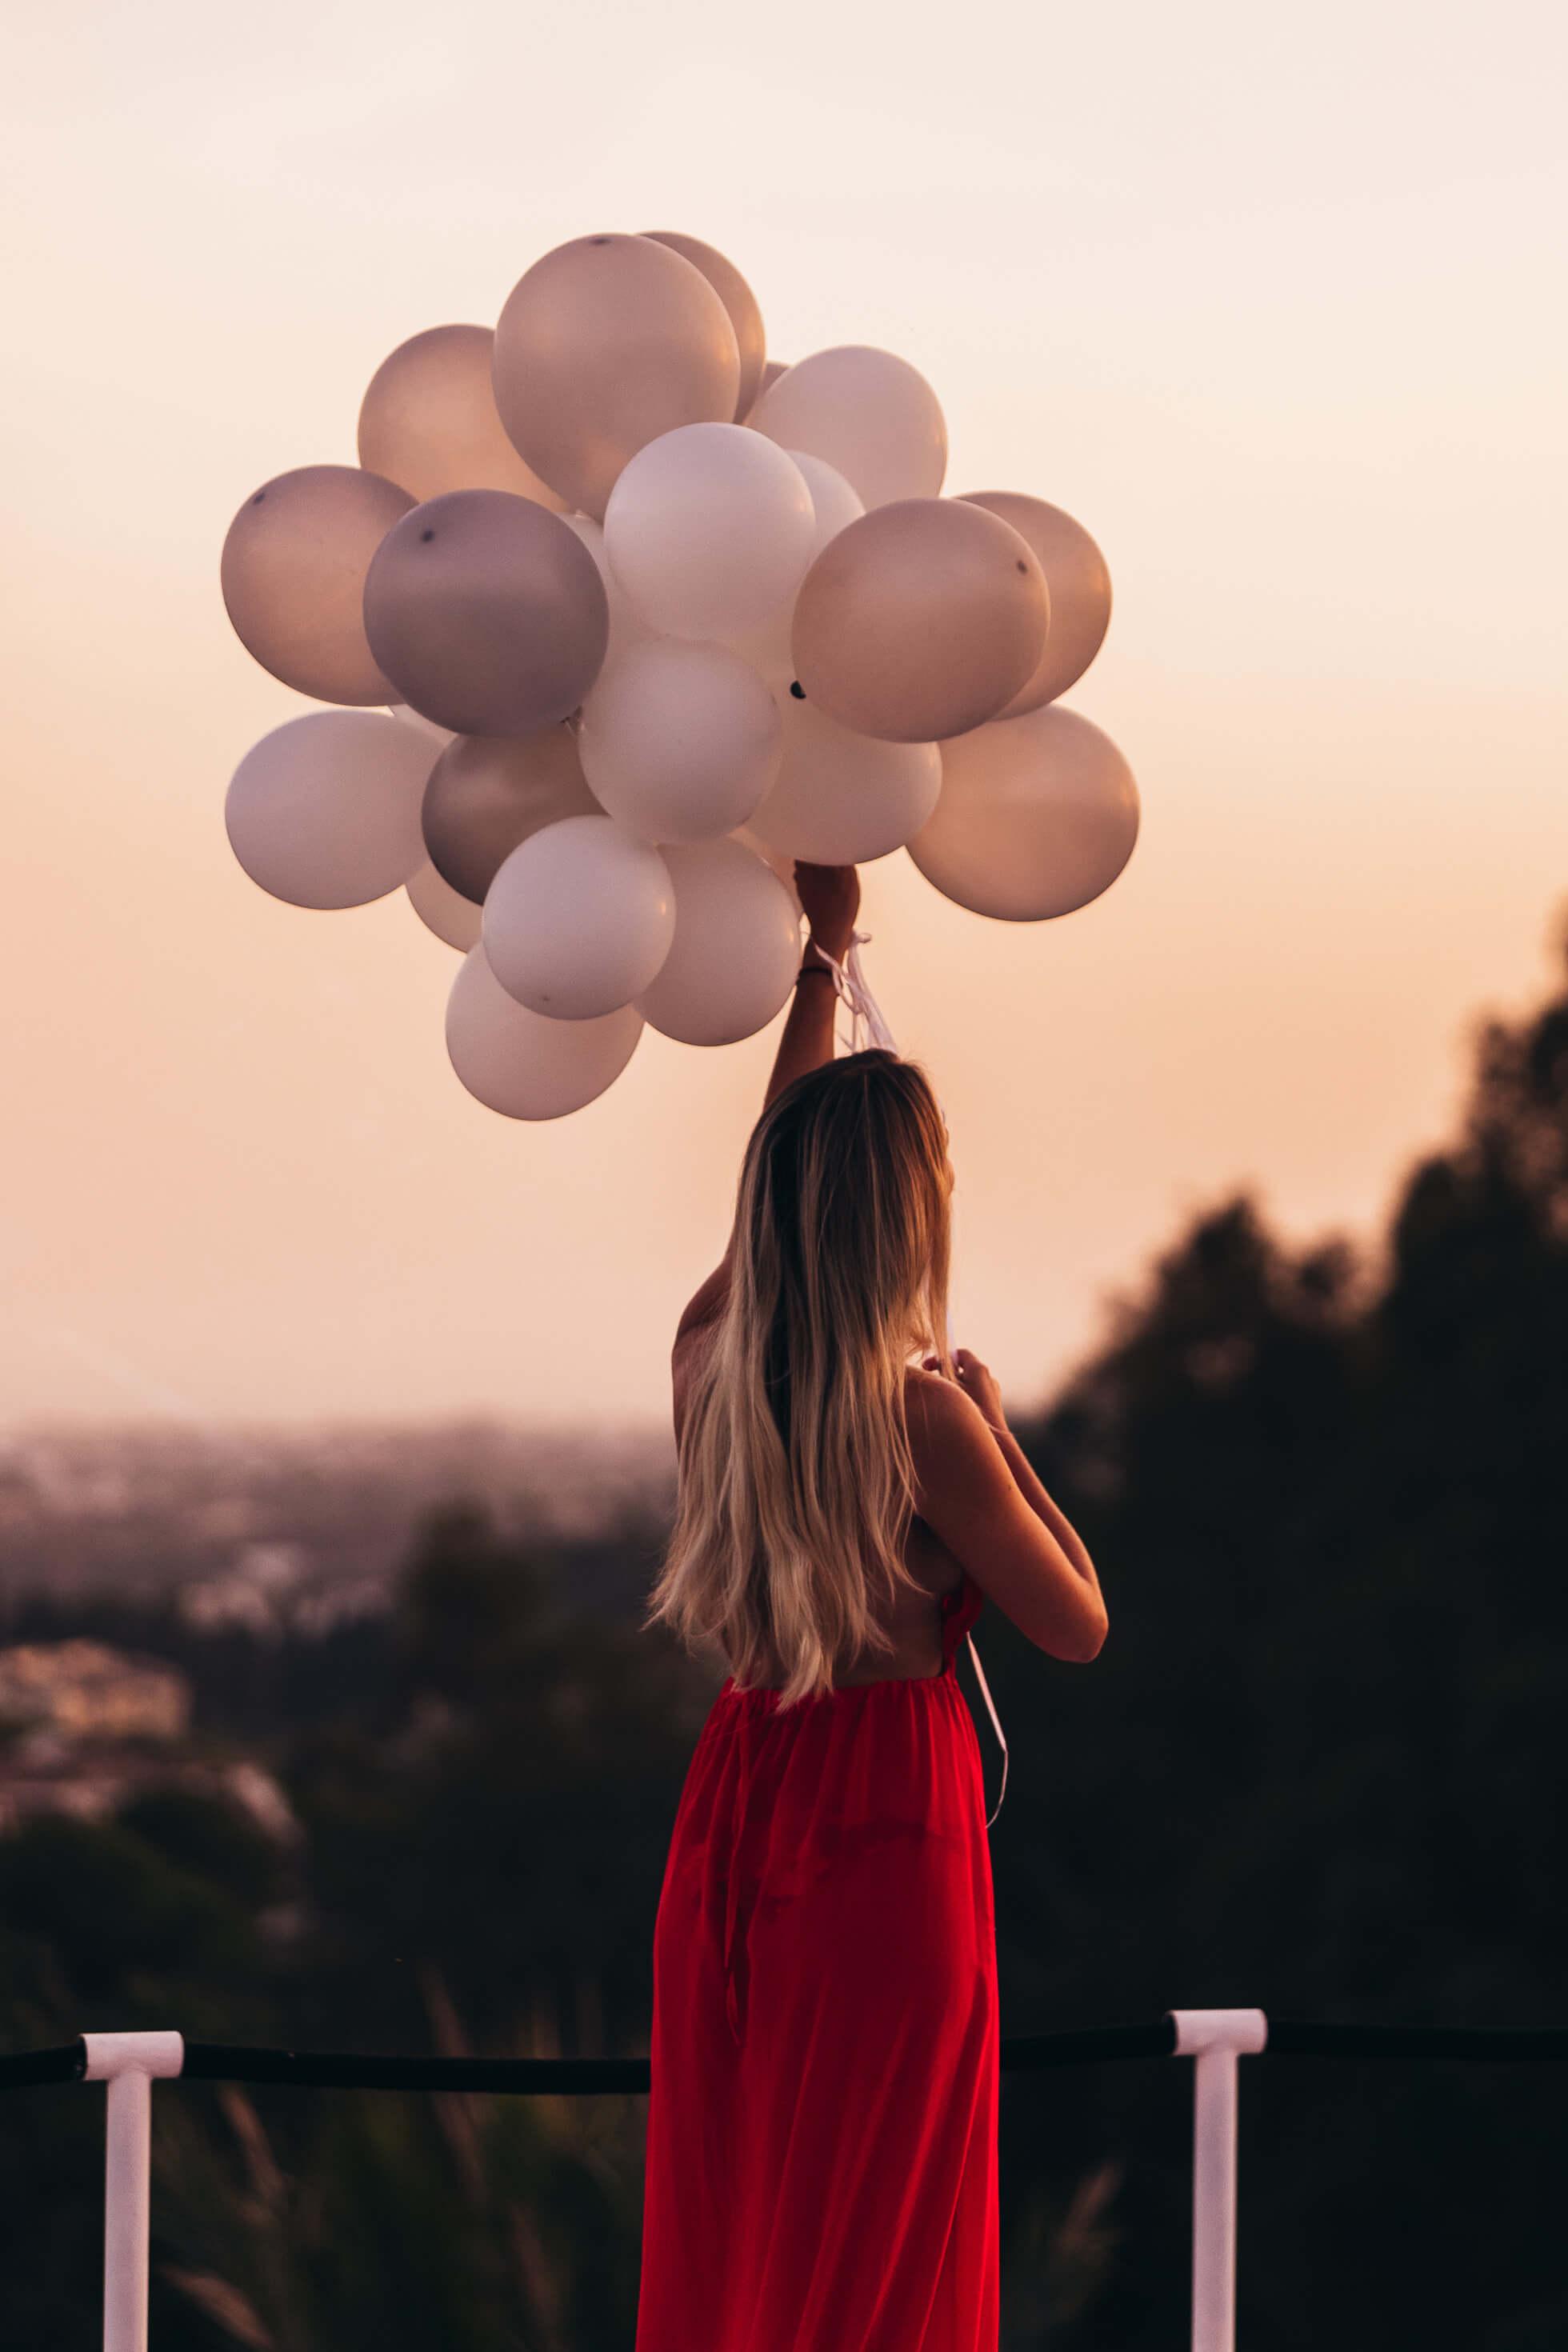 janni-deler-balloon-marbellaj1280293